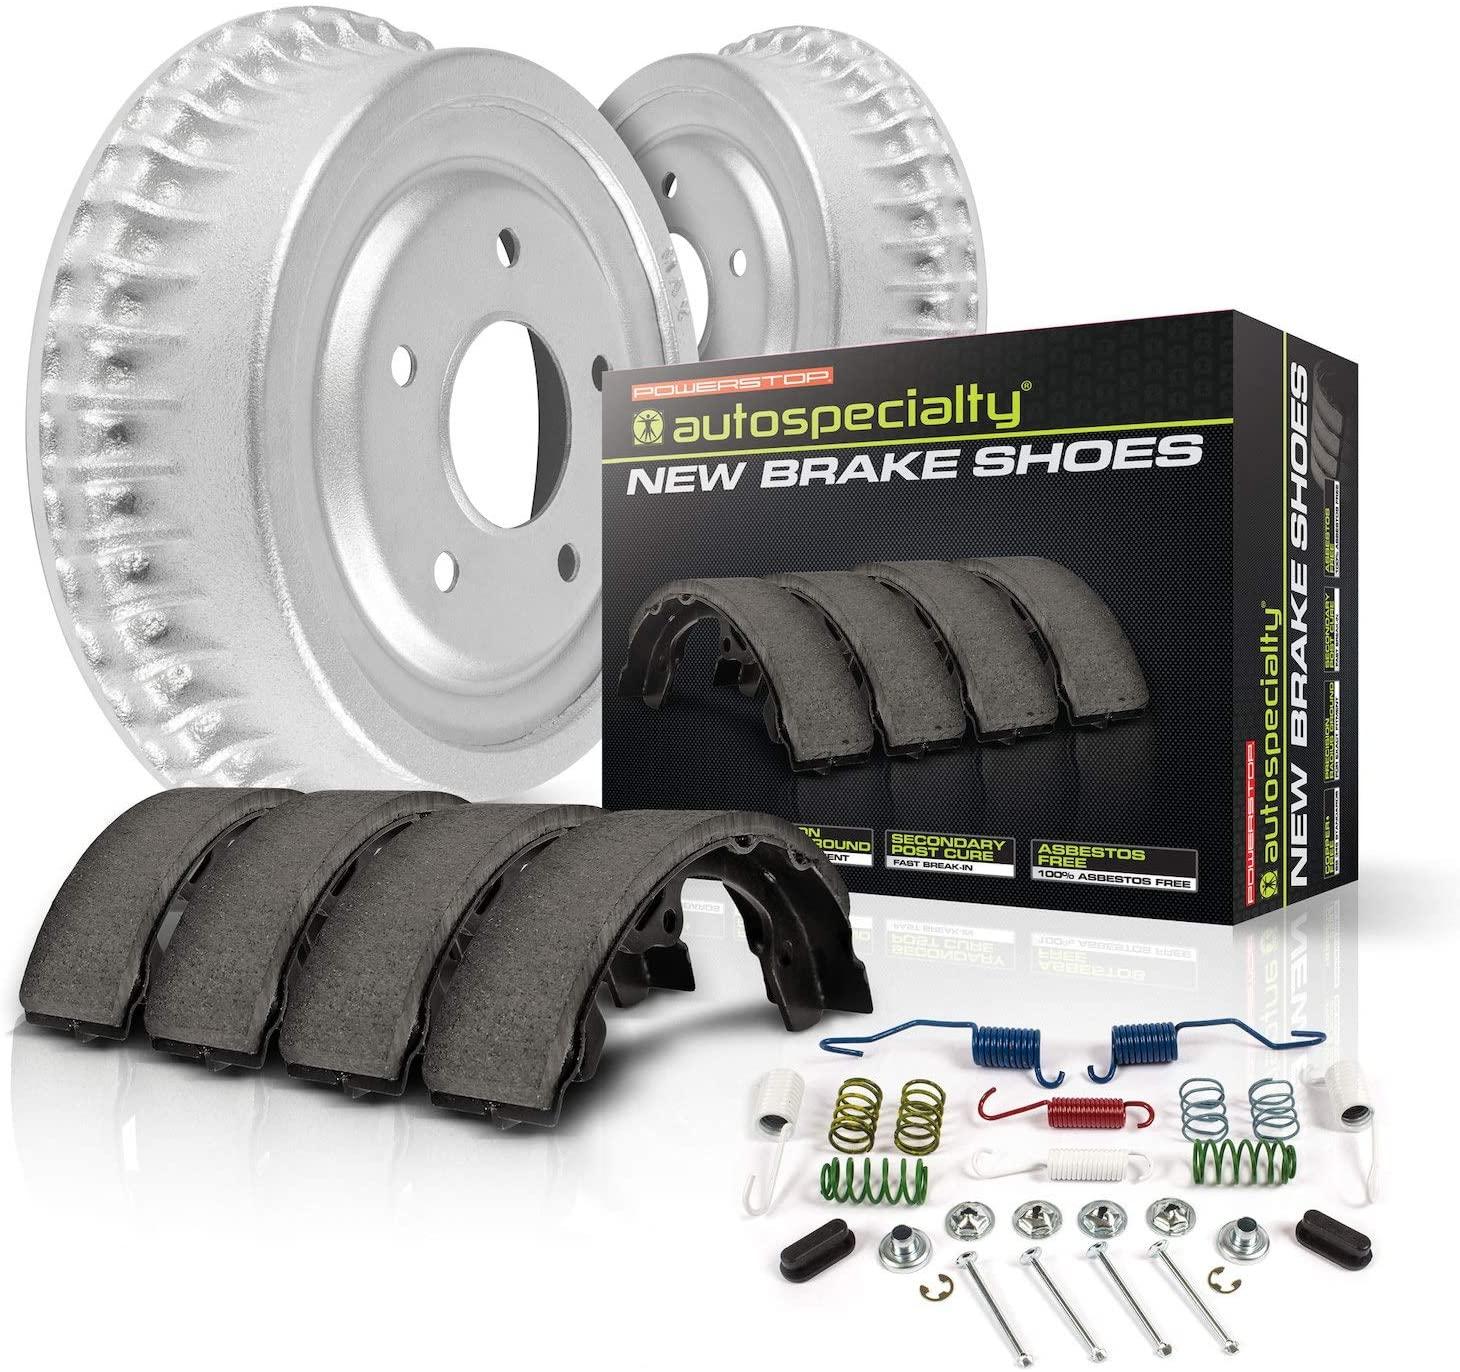 Power Stop KOE15313DK Autospeciality Replacement Rear Brake Kit- OE Rotors & Ceramic Brake Pads